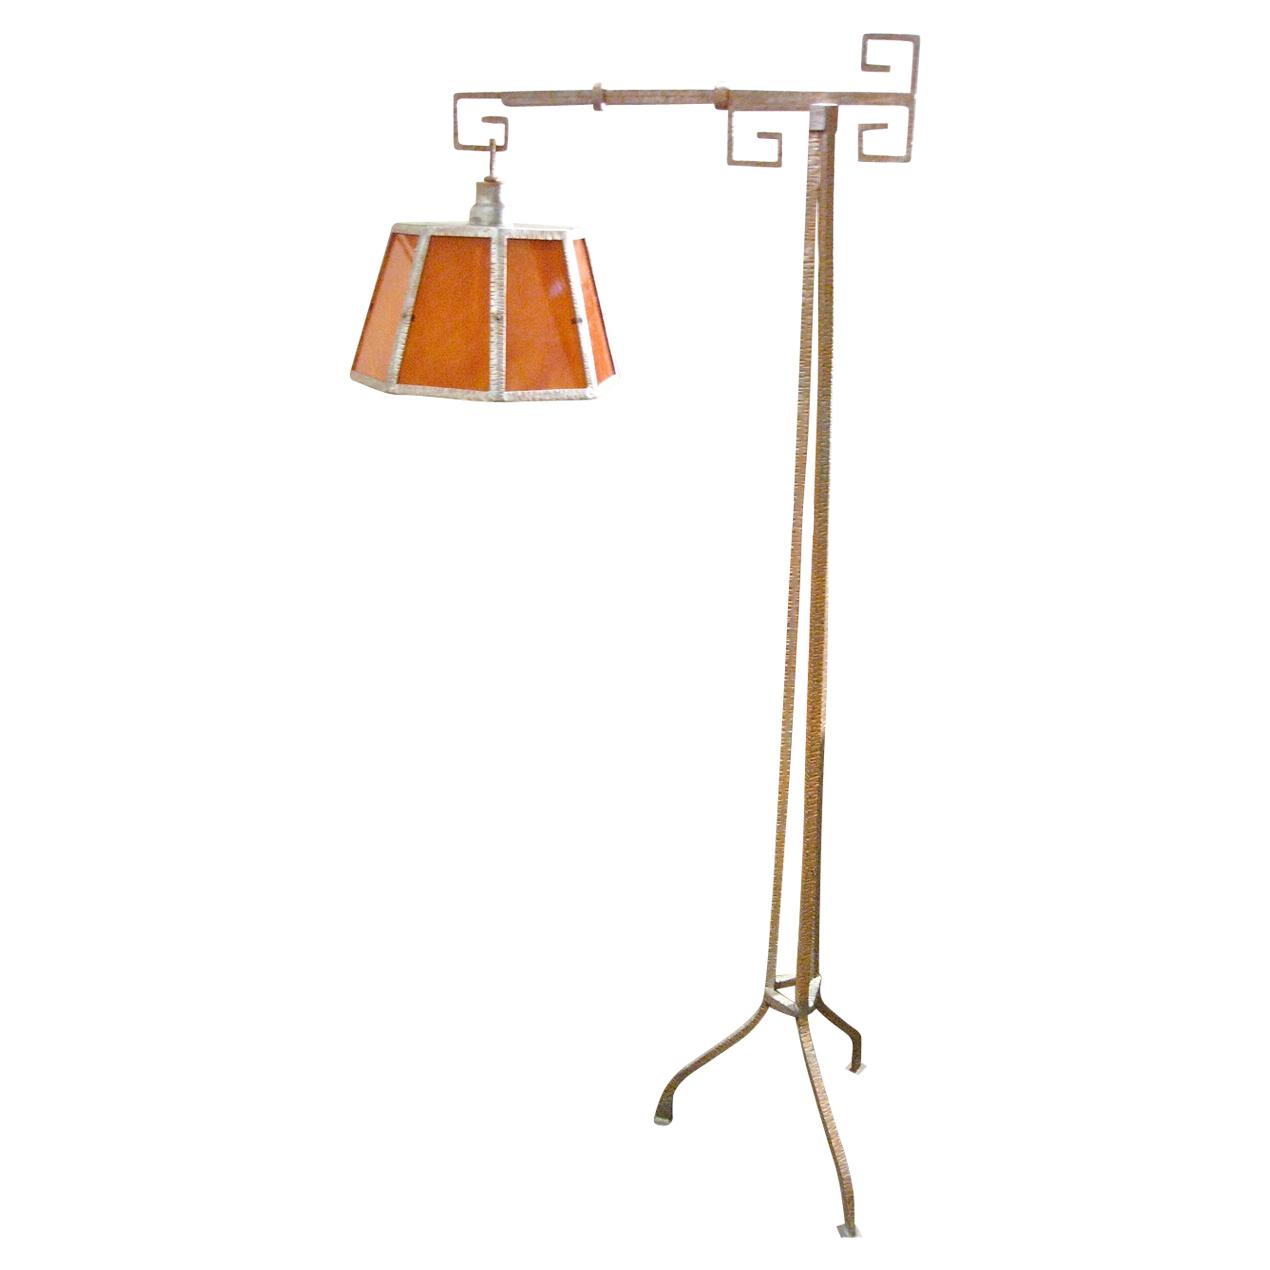 art deco floor lamps for sale art deco torchieres made from alabaster. Black Bedroom Furniture Sets. Home Design Ideas